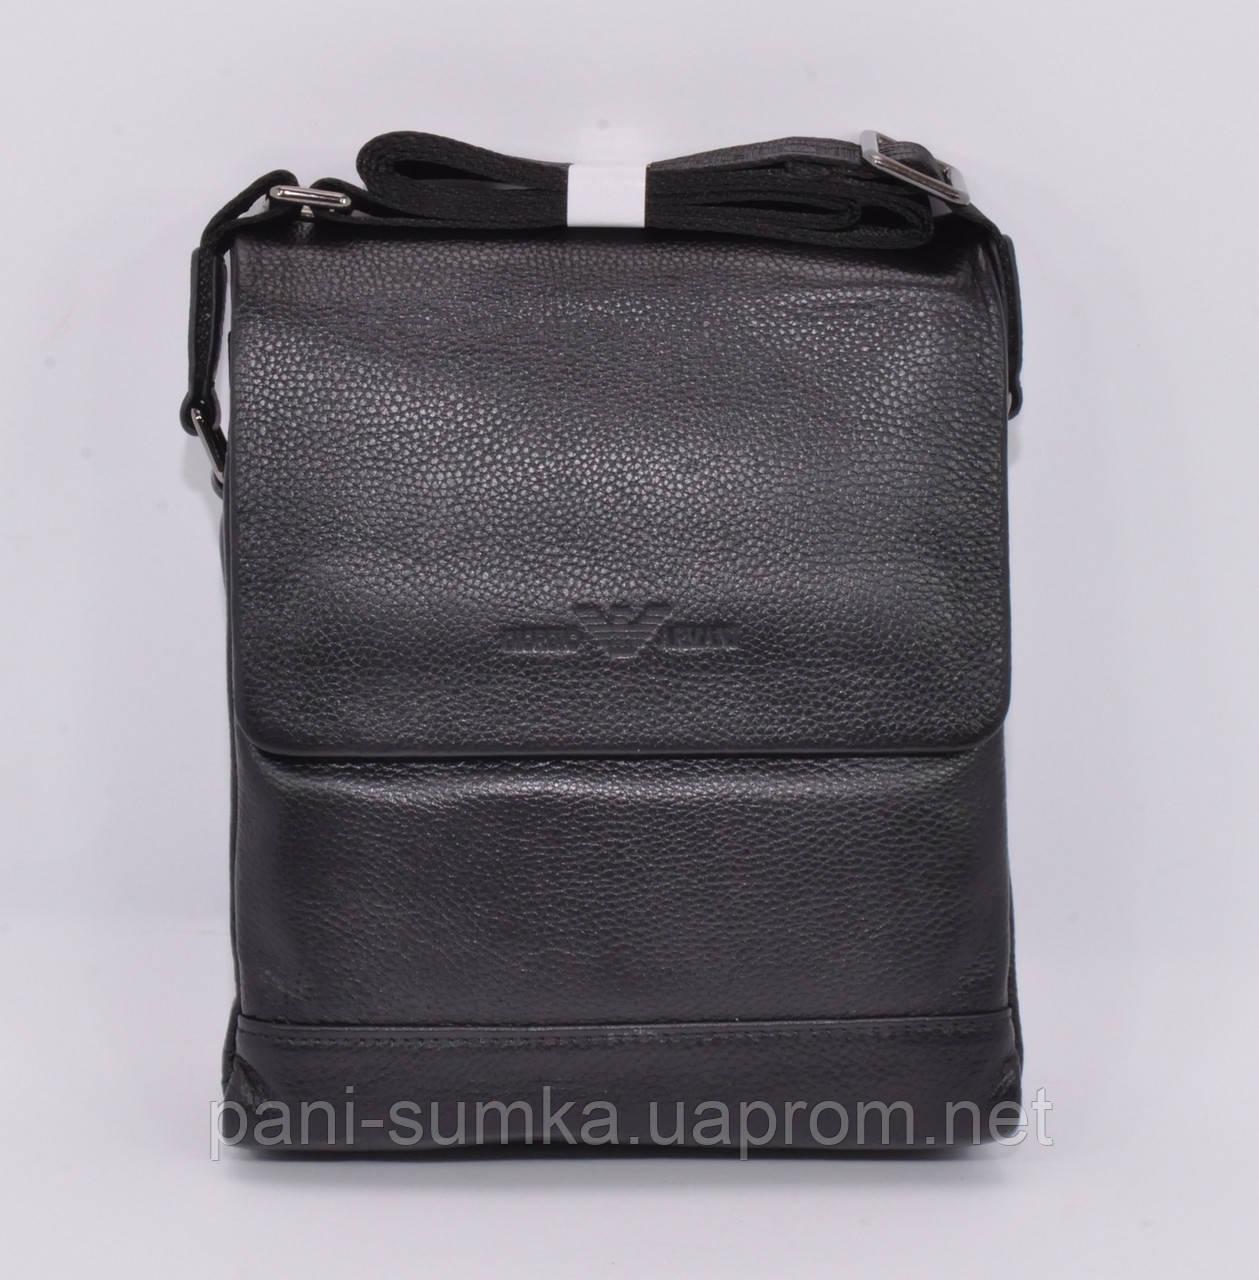 5b80076c9b63 сумка мужская кожаная Giorgio Armani 7911 1 черная цена 1 189 грн